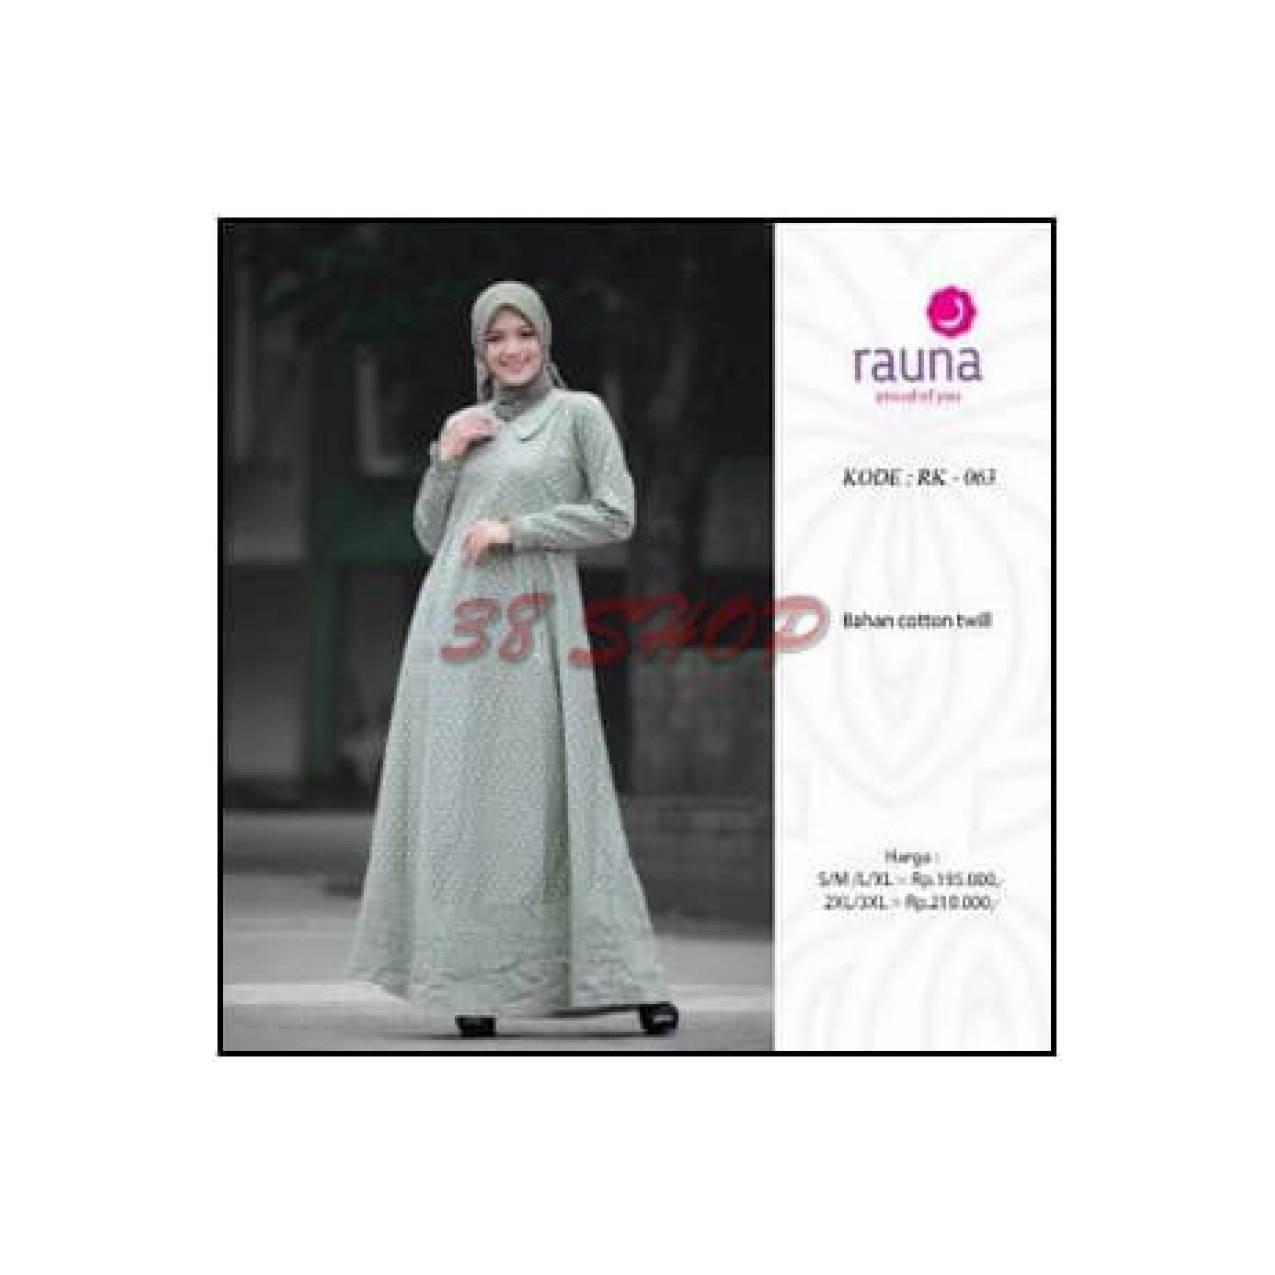 Hot Promo Gamis katun rauna rk 063/ gamis polkadot/ baju muslim terbar